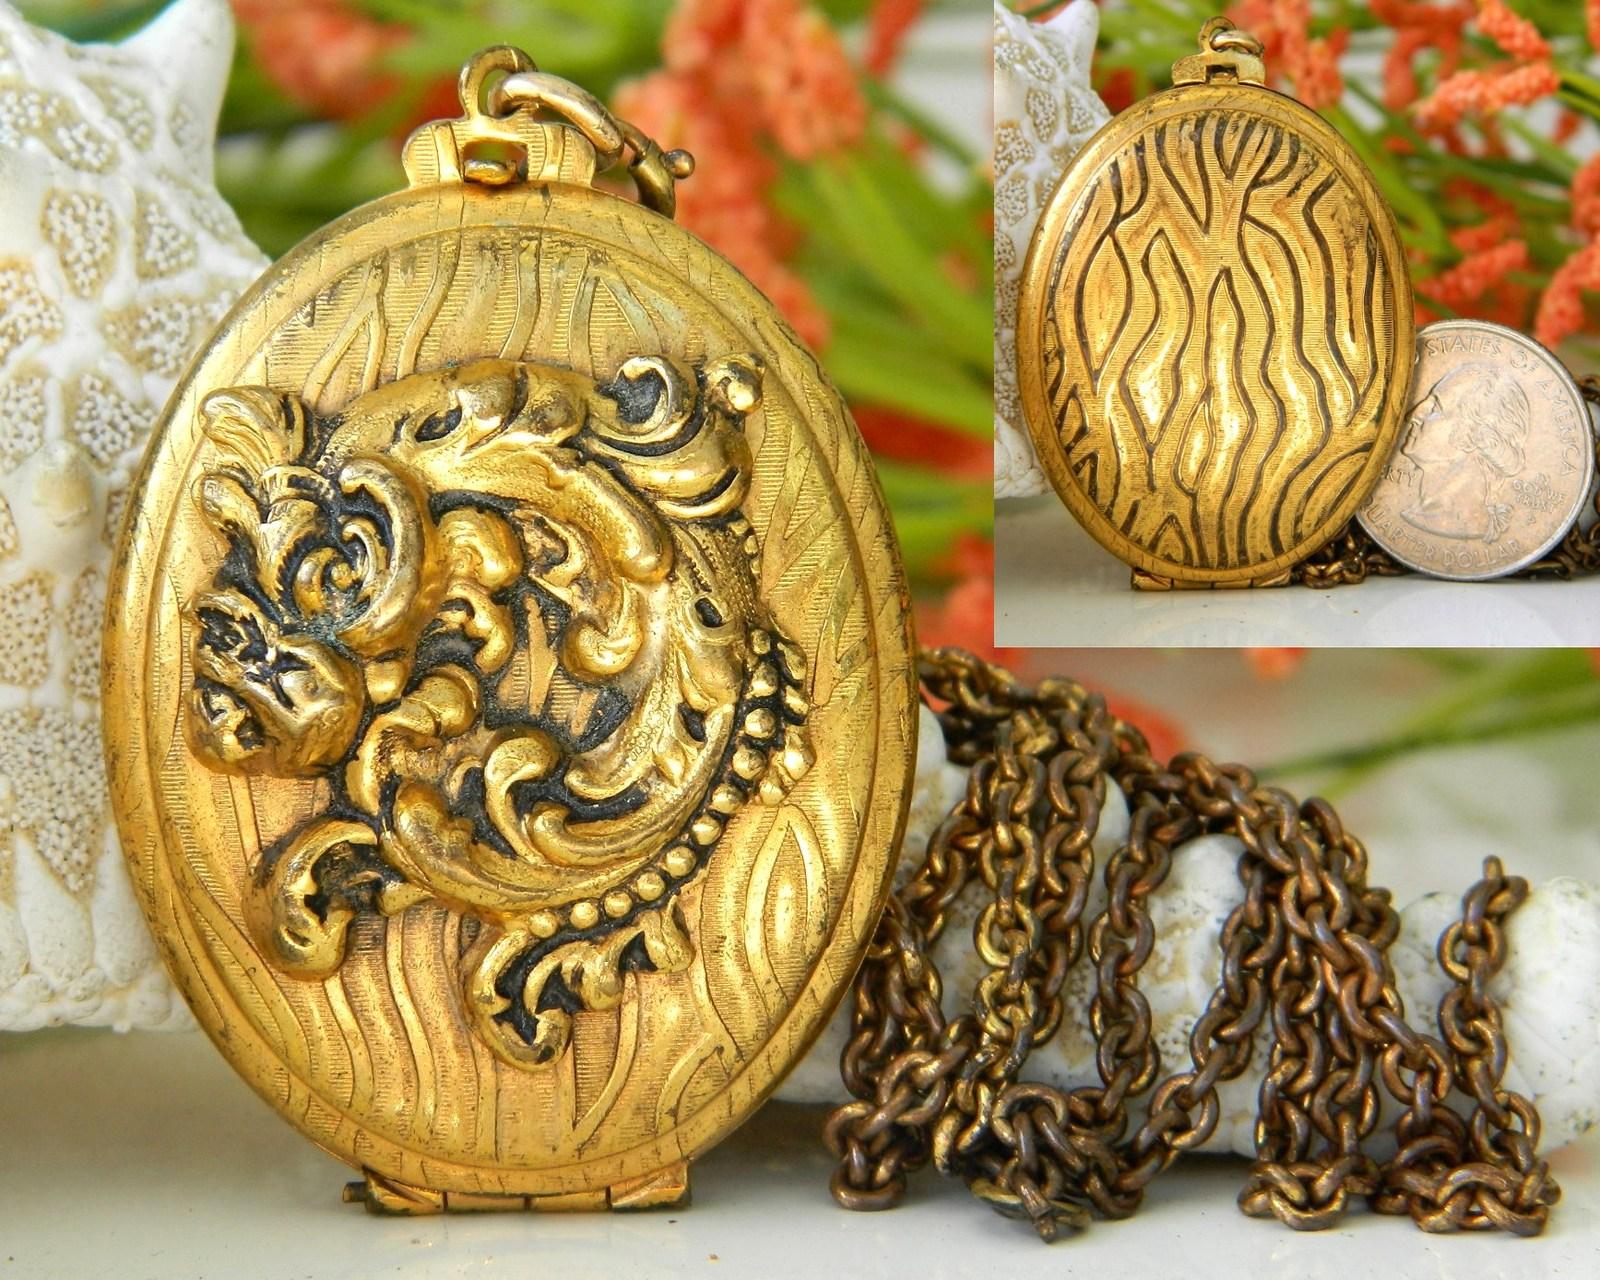 Vintage brass locket pendant necklace gold black pattern